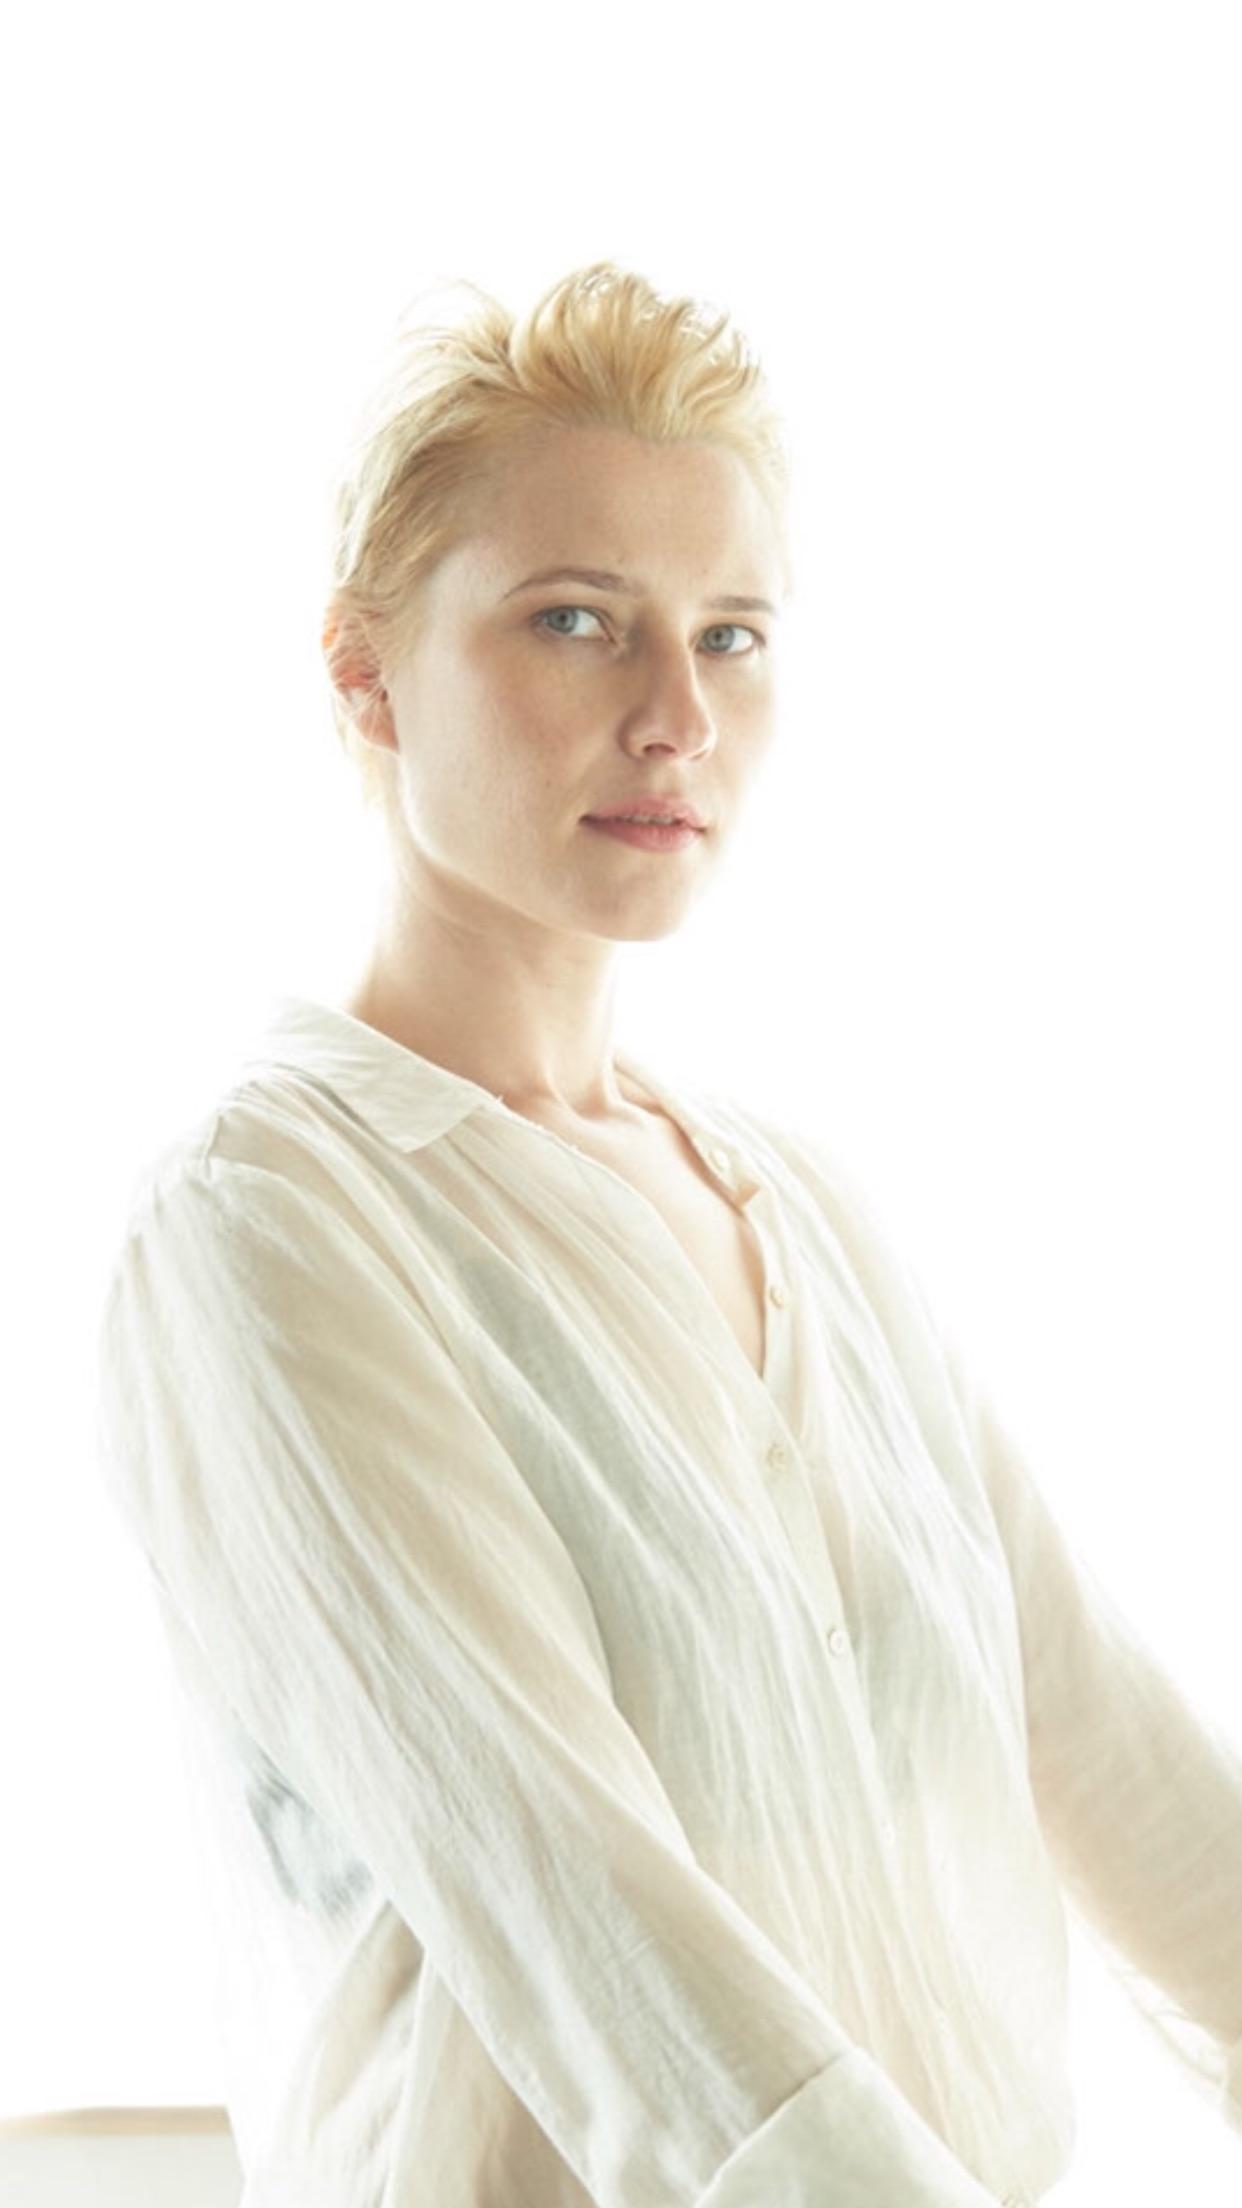 - A classic and elegant photo of Maria